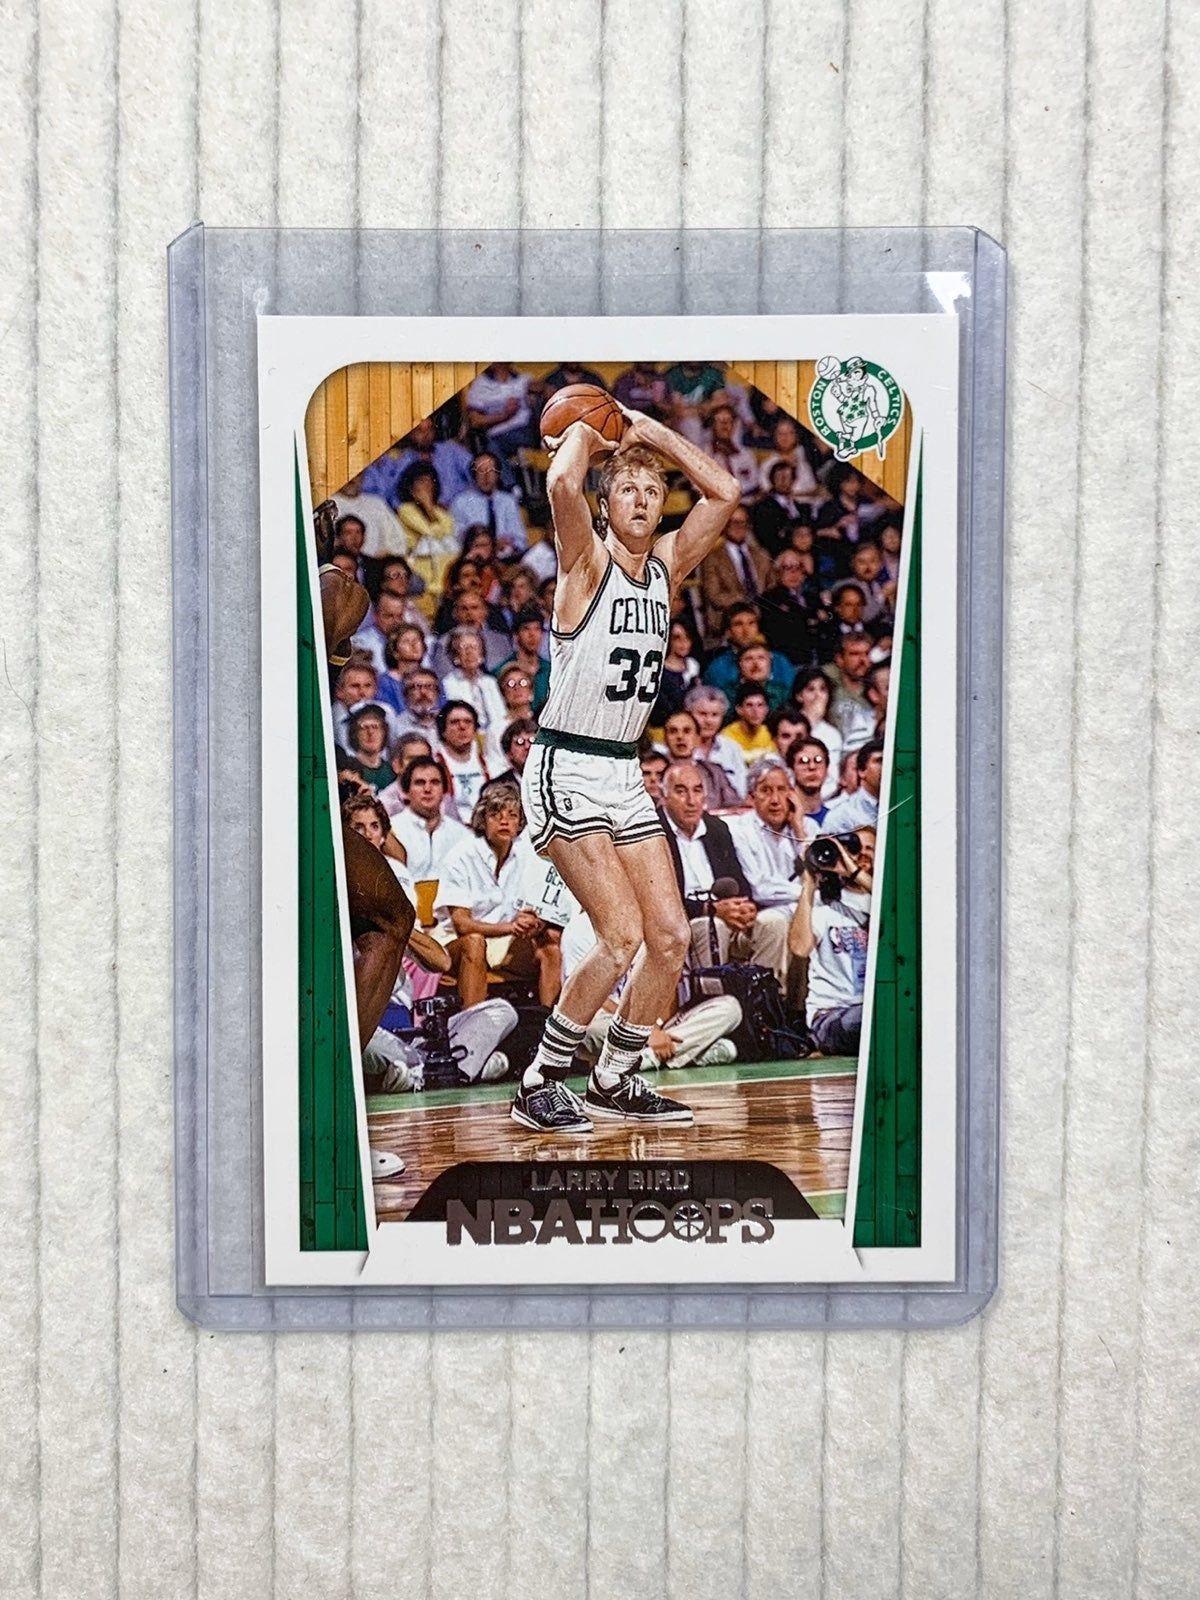 Nba larry bird boston celtics nba hoops basketball card